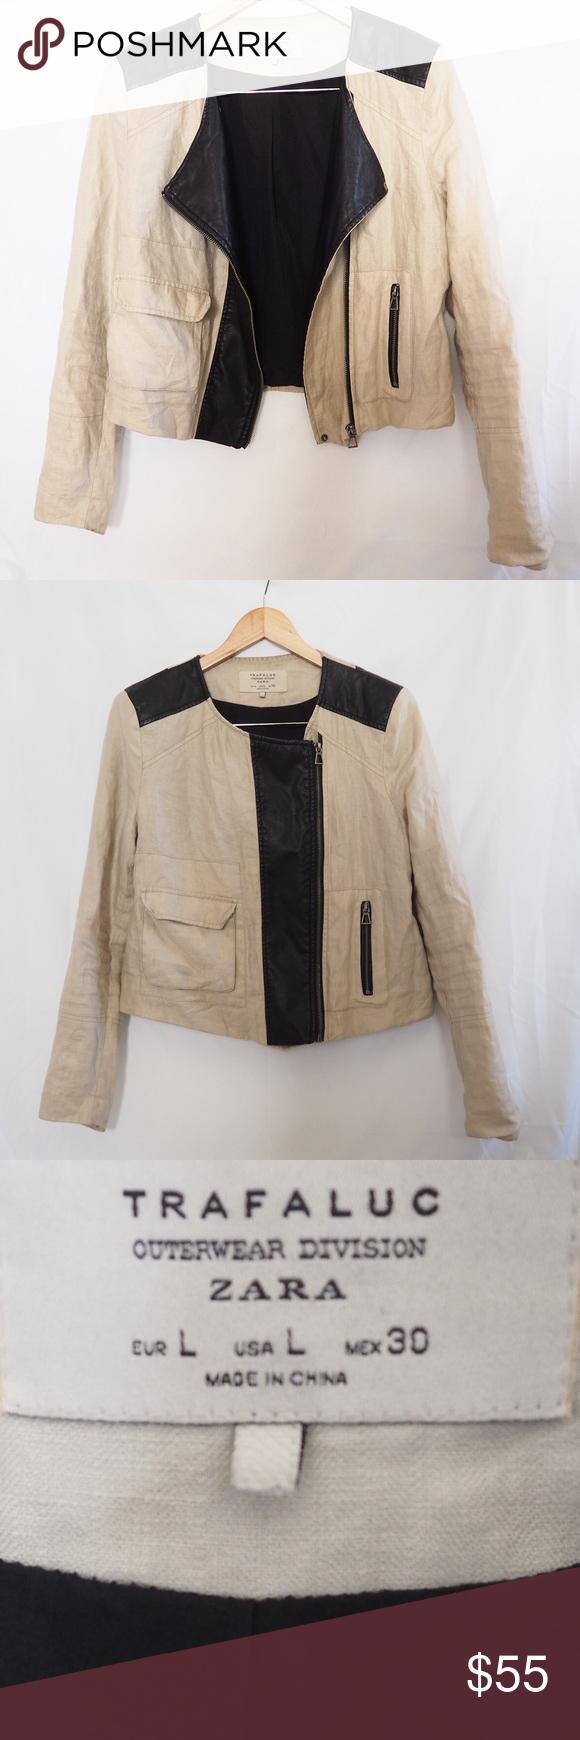 Zara Trafaluc Moto Jacket Jackets Moto Jacket Zara [ 1740 x 580 Pixel ]